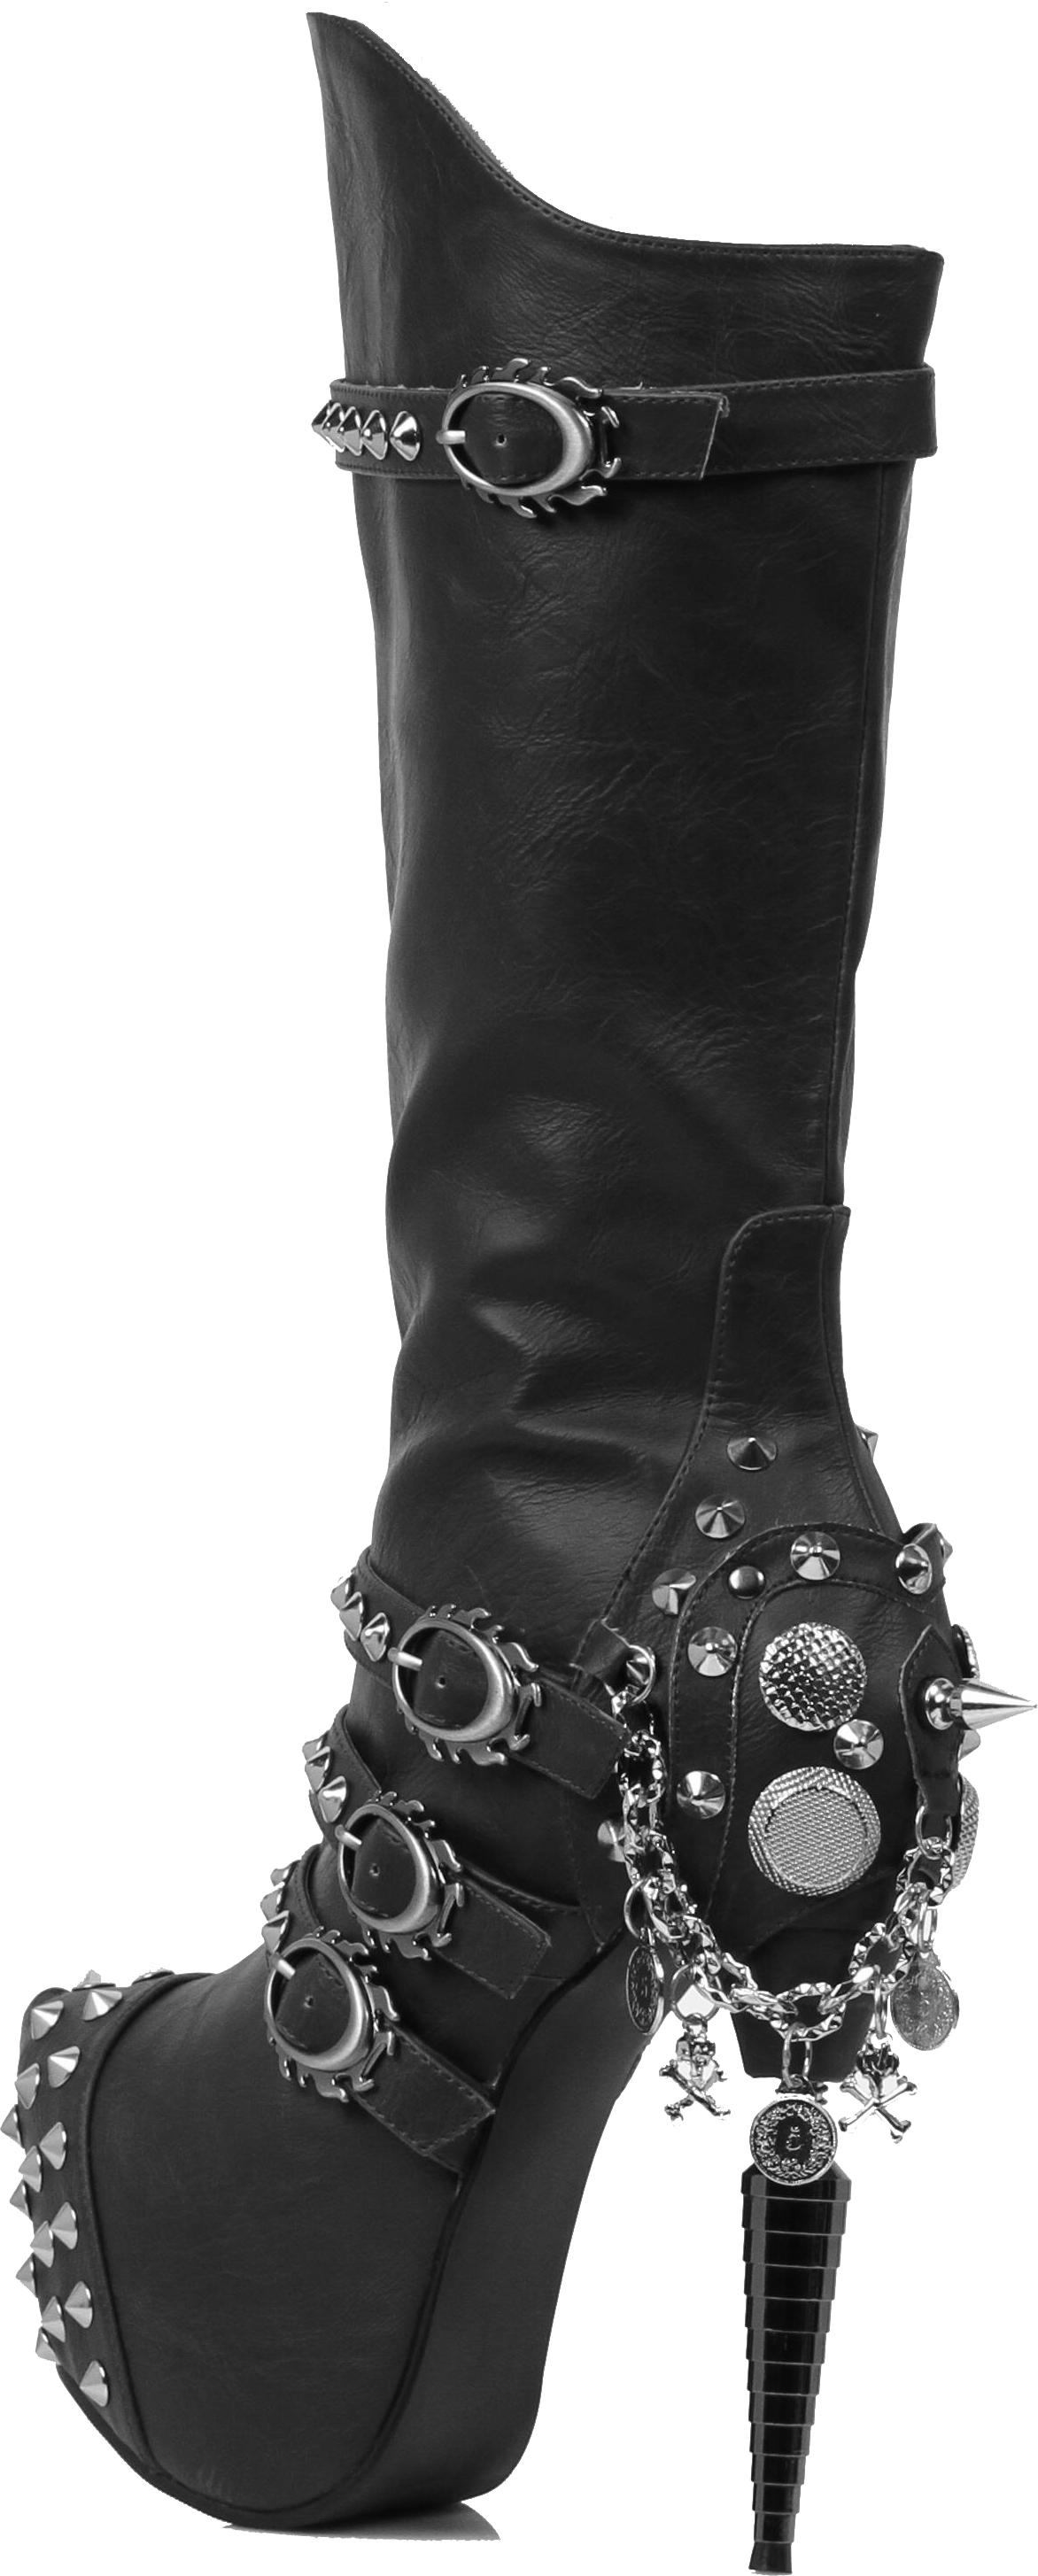 hades_shoes_womens_valda_black_steampunk_boots_boots_5.jpg